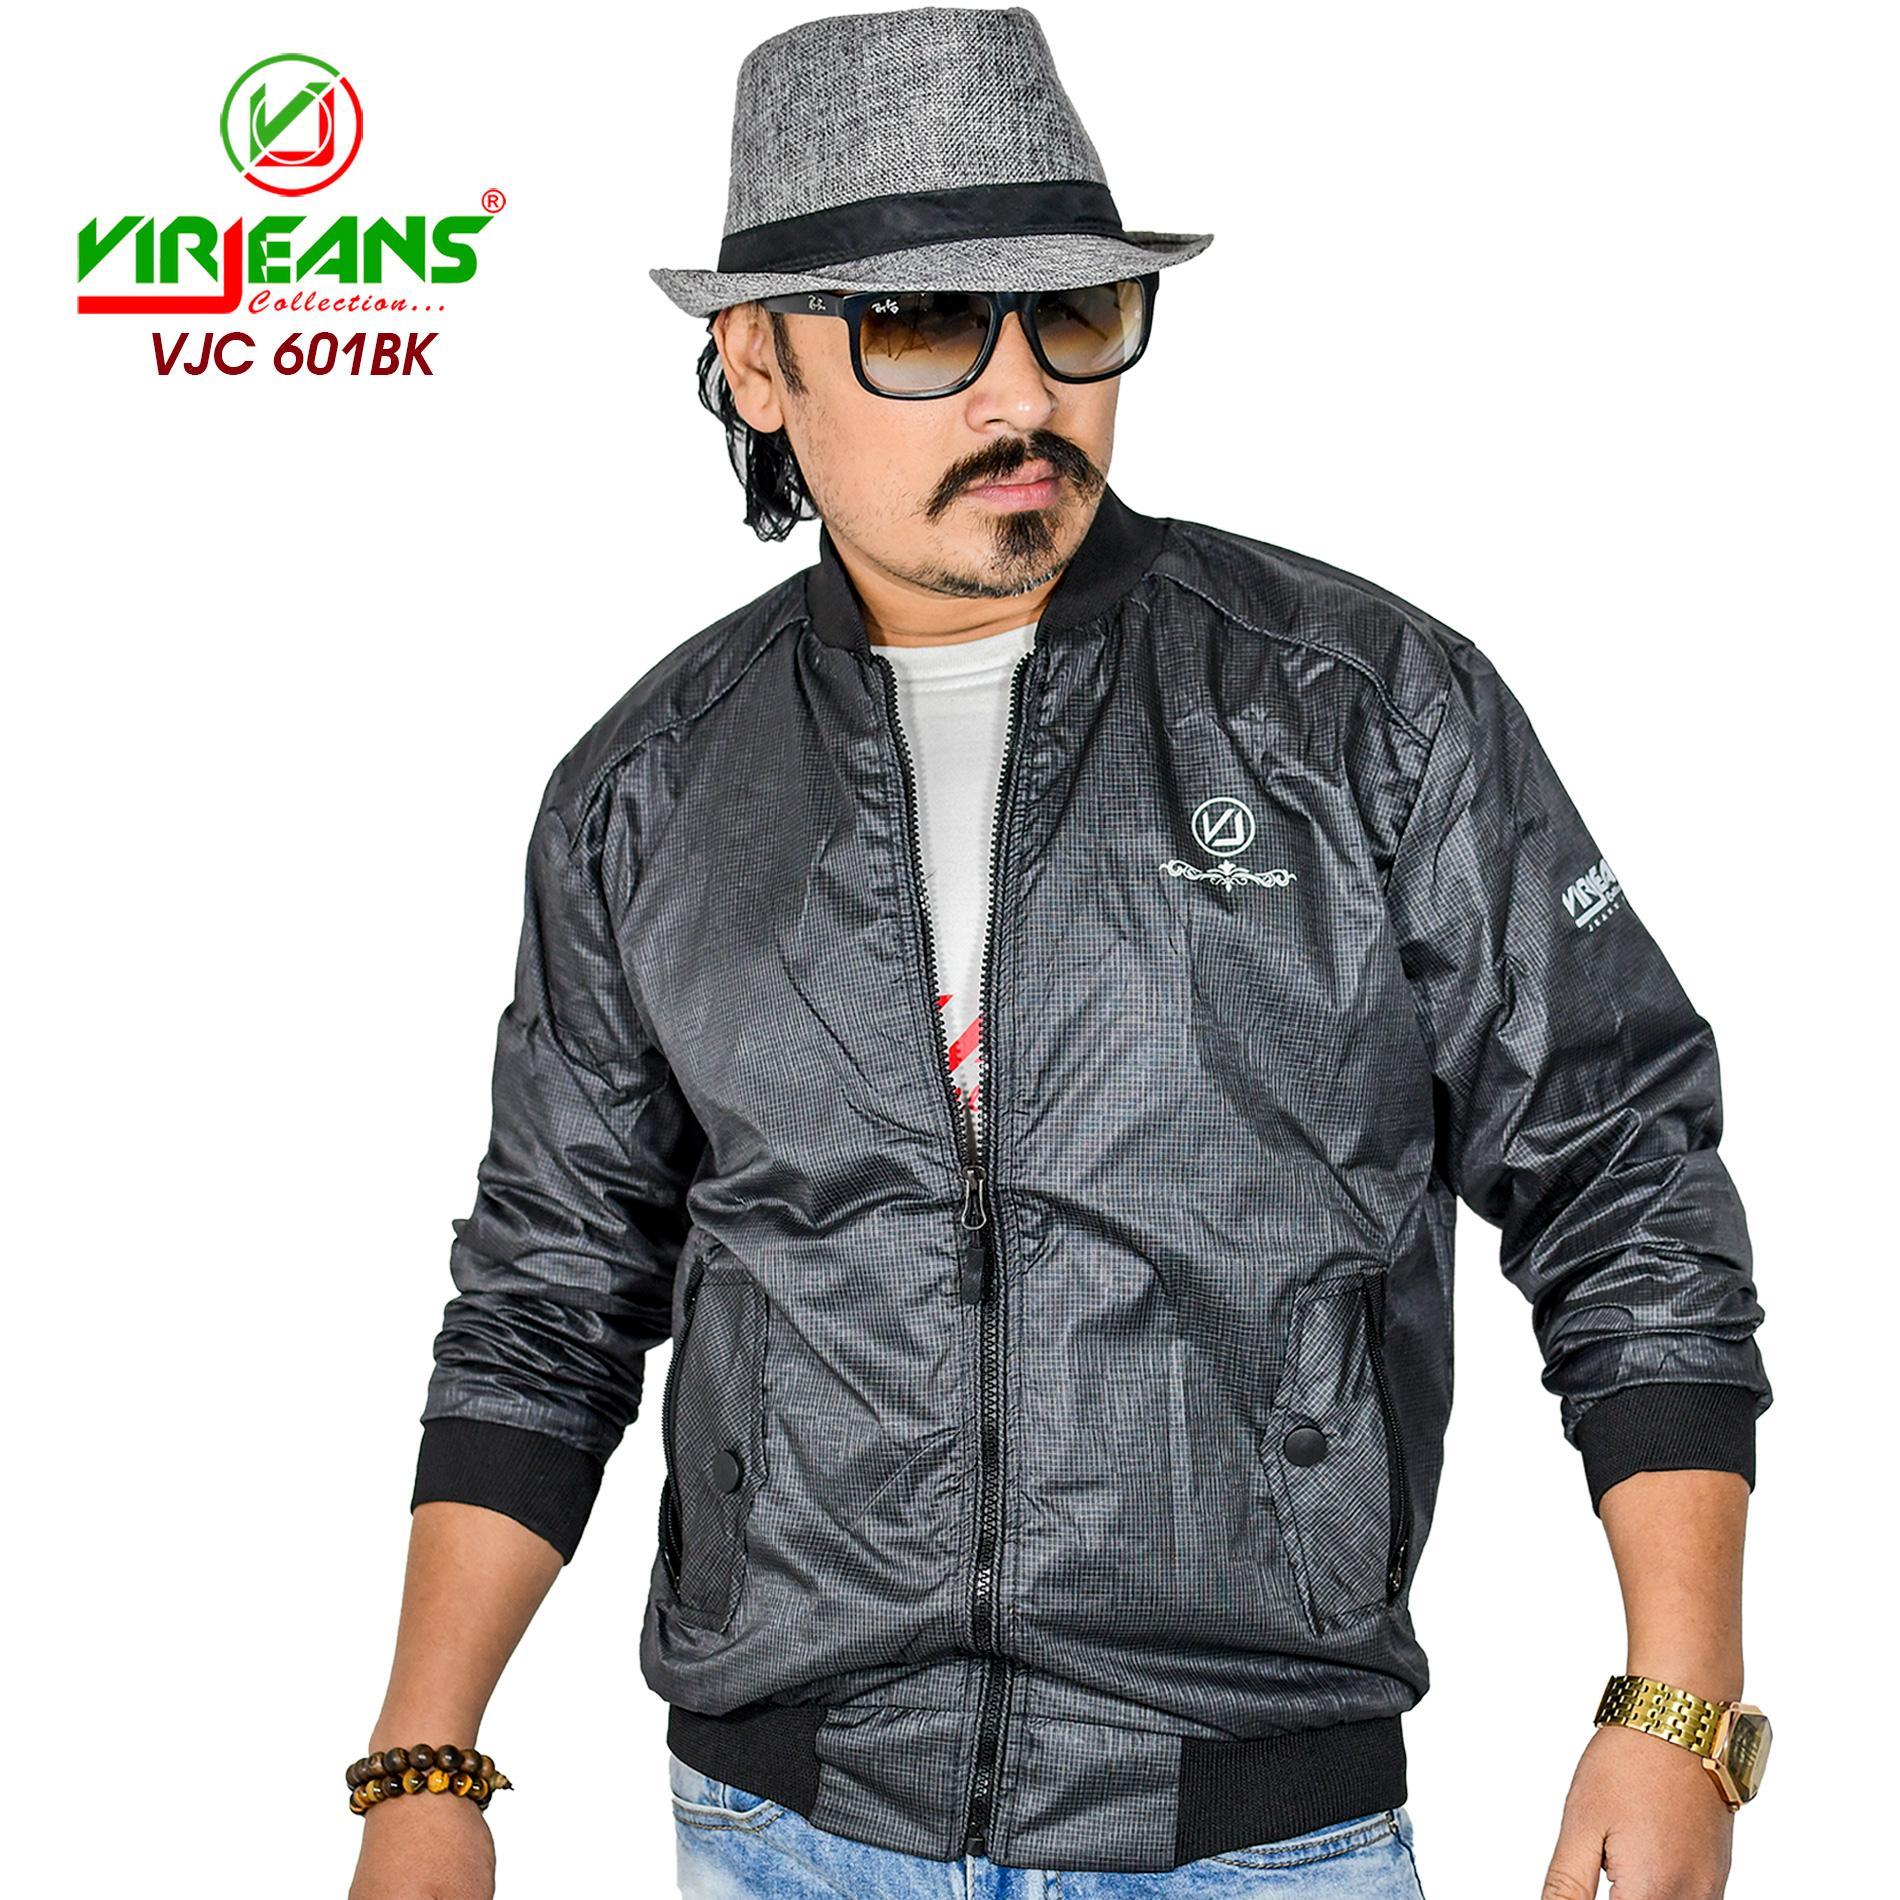 Virjeans New Fall Fashion Casual Zipper Round Neck Collar Slim Streetwear Bomber Jacket Windcheater (VJC 601)